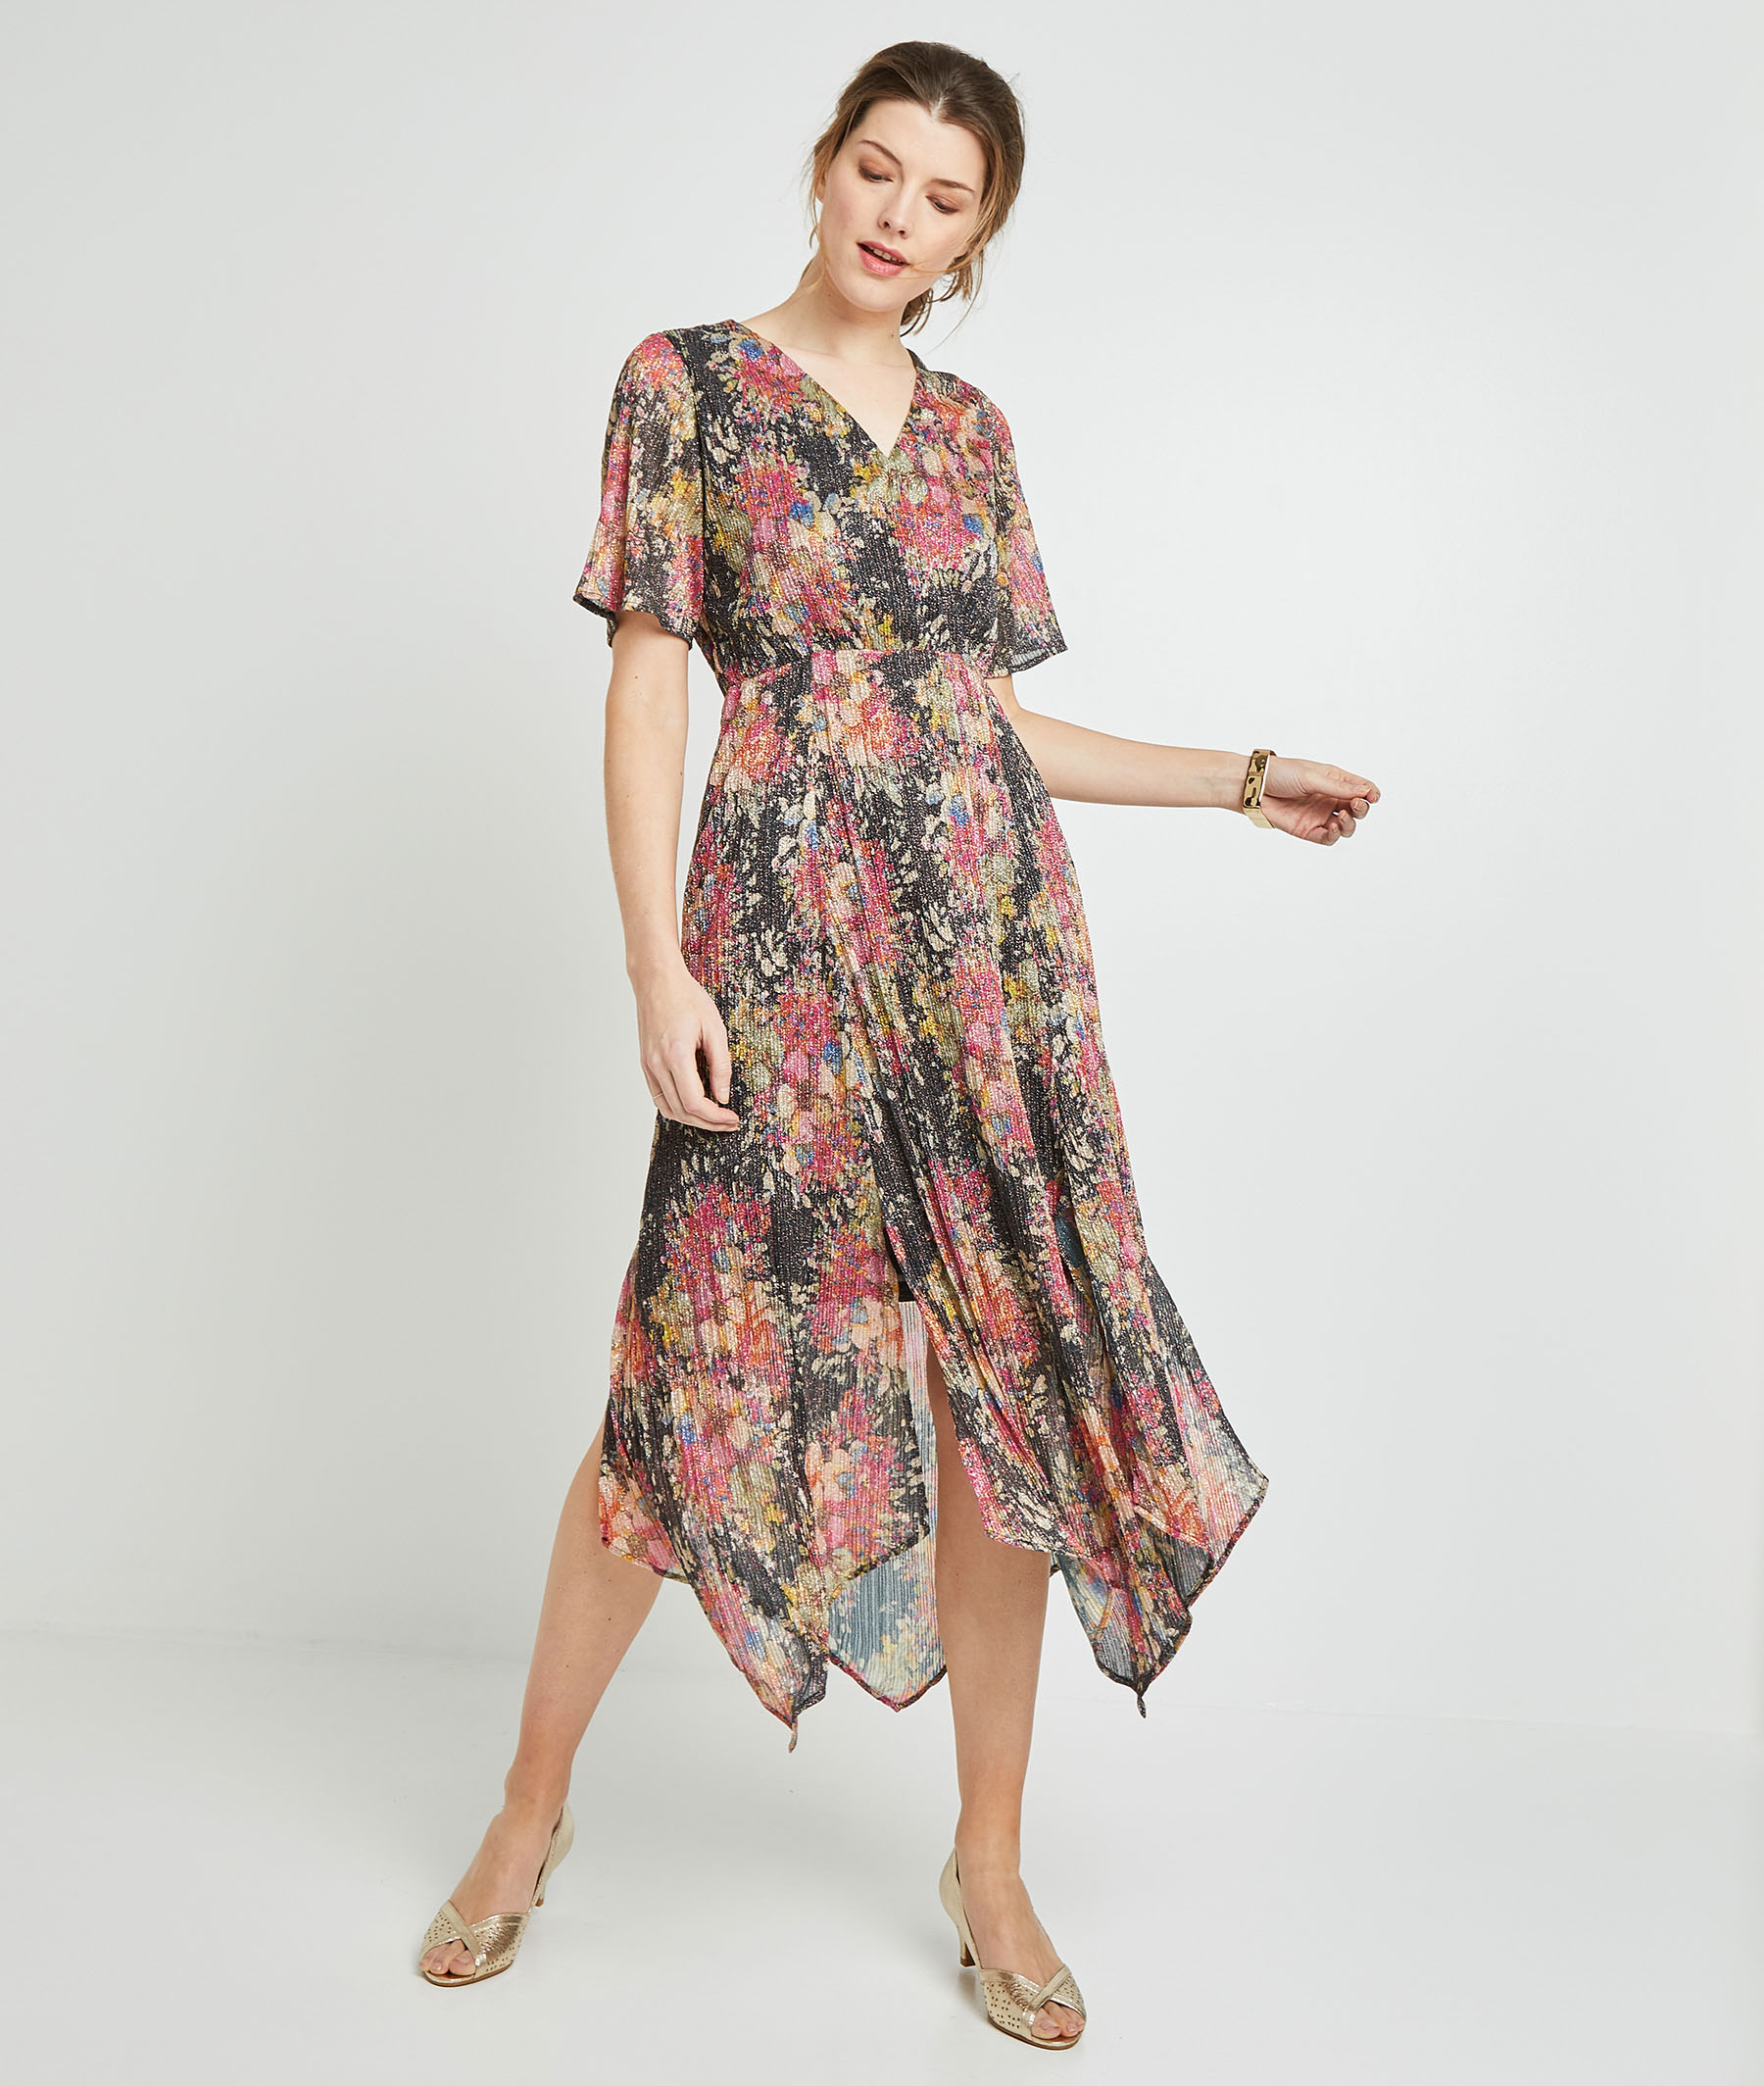 Robe longue cache-coeur femme MULTICOLORE